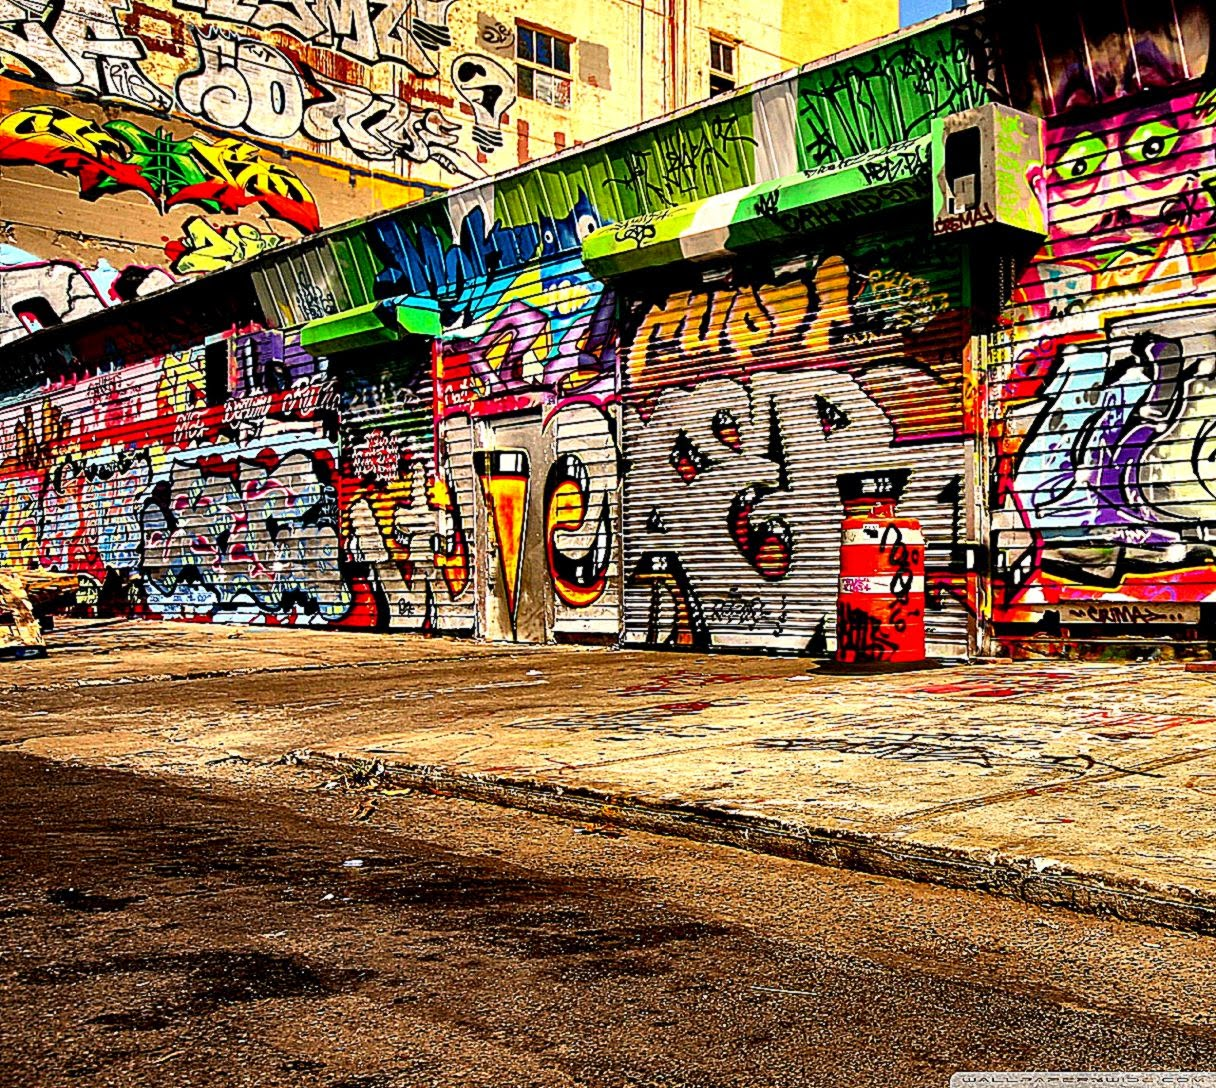 Great Wallpaper High Resolution Android - graffiti-art-on-walls-hd-desktop-wallpaper-high-definition  Pictures_997019.jpg